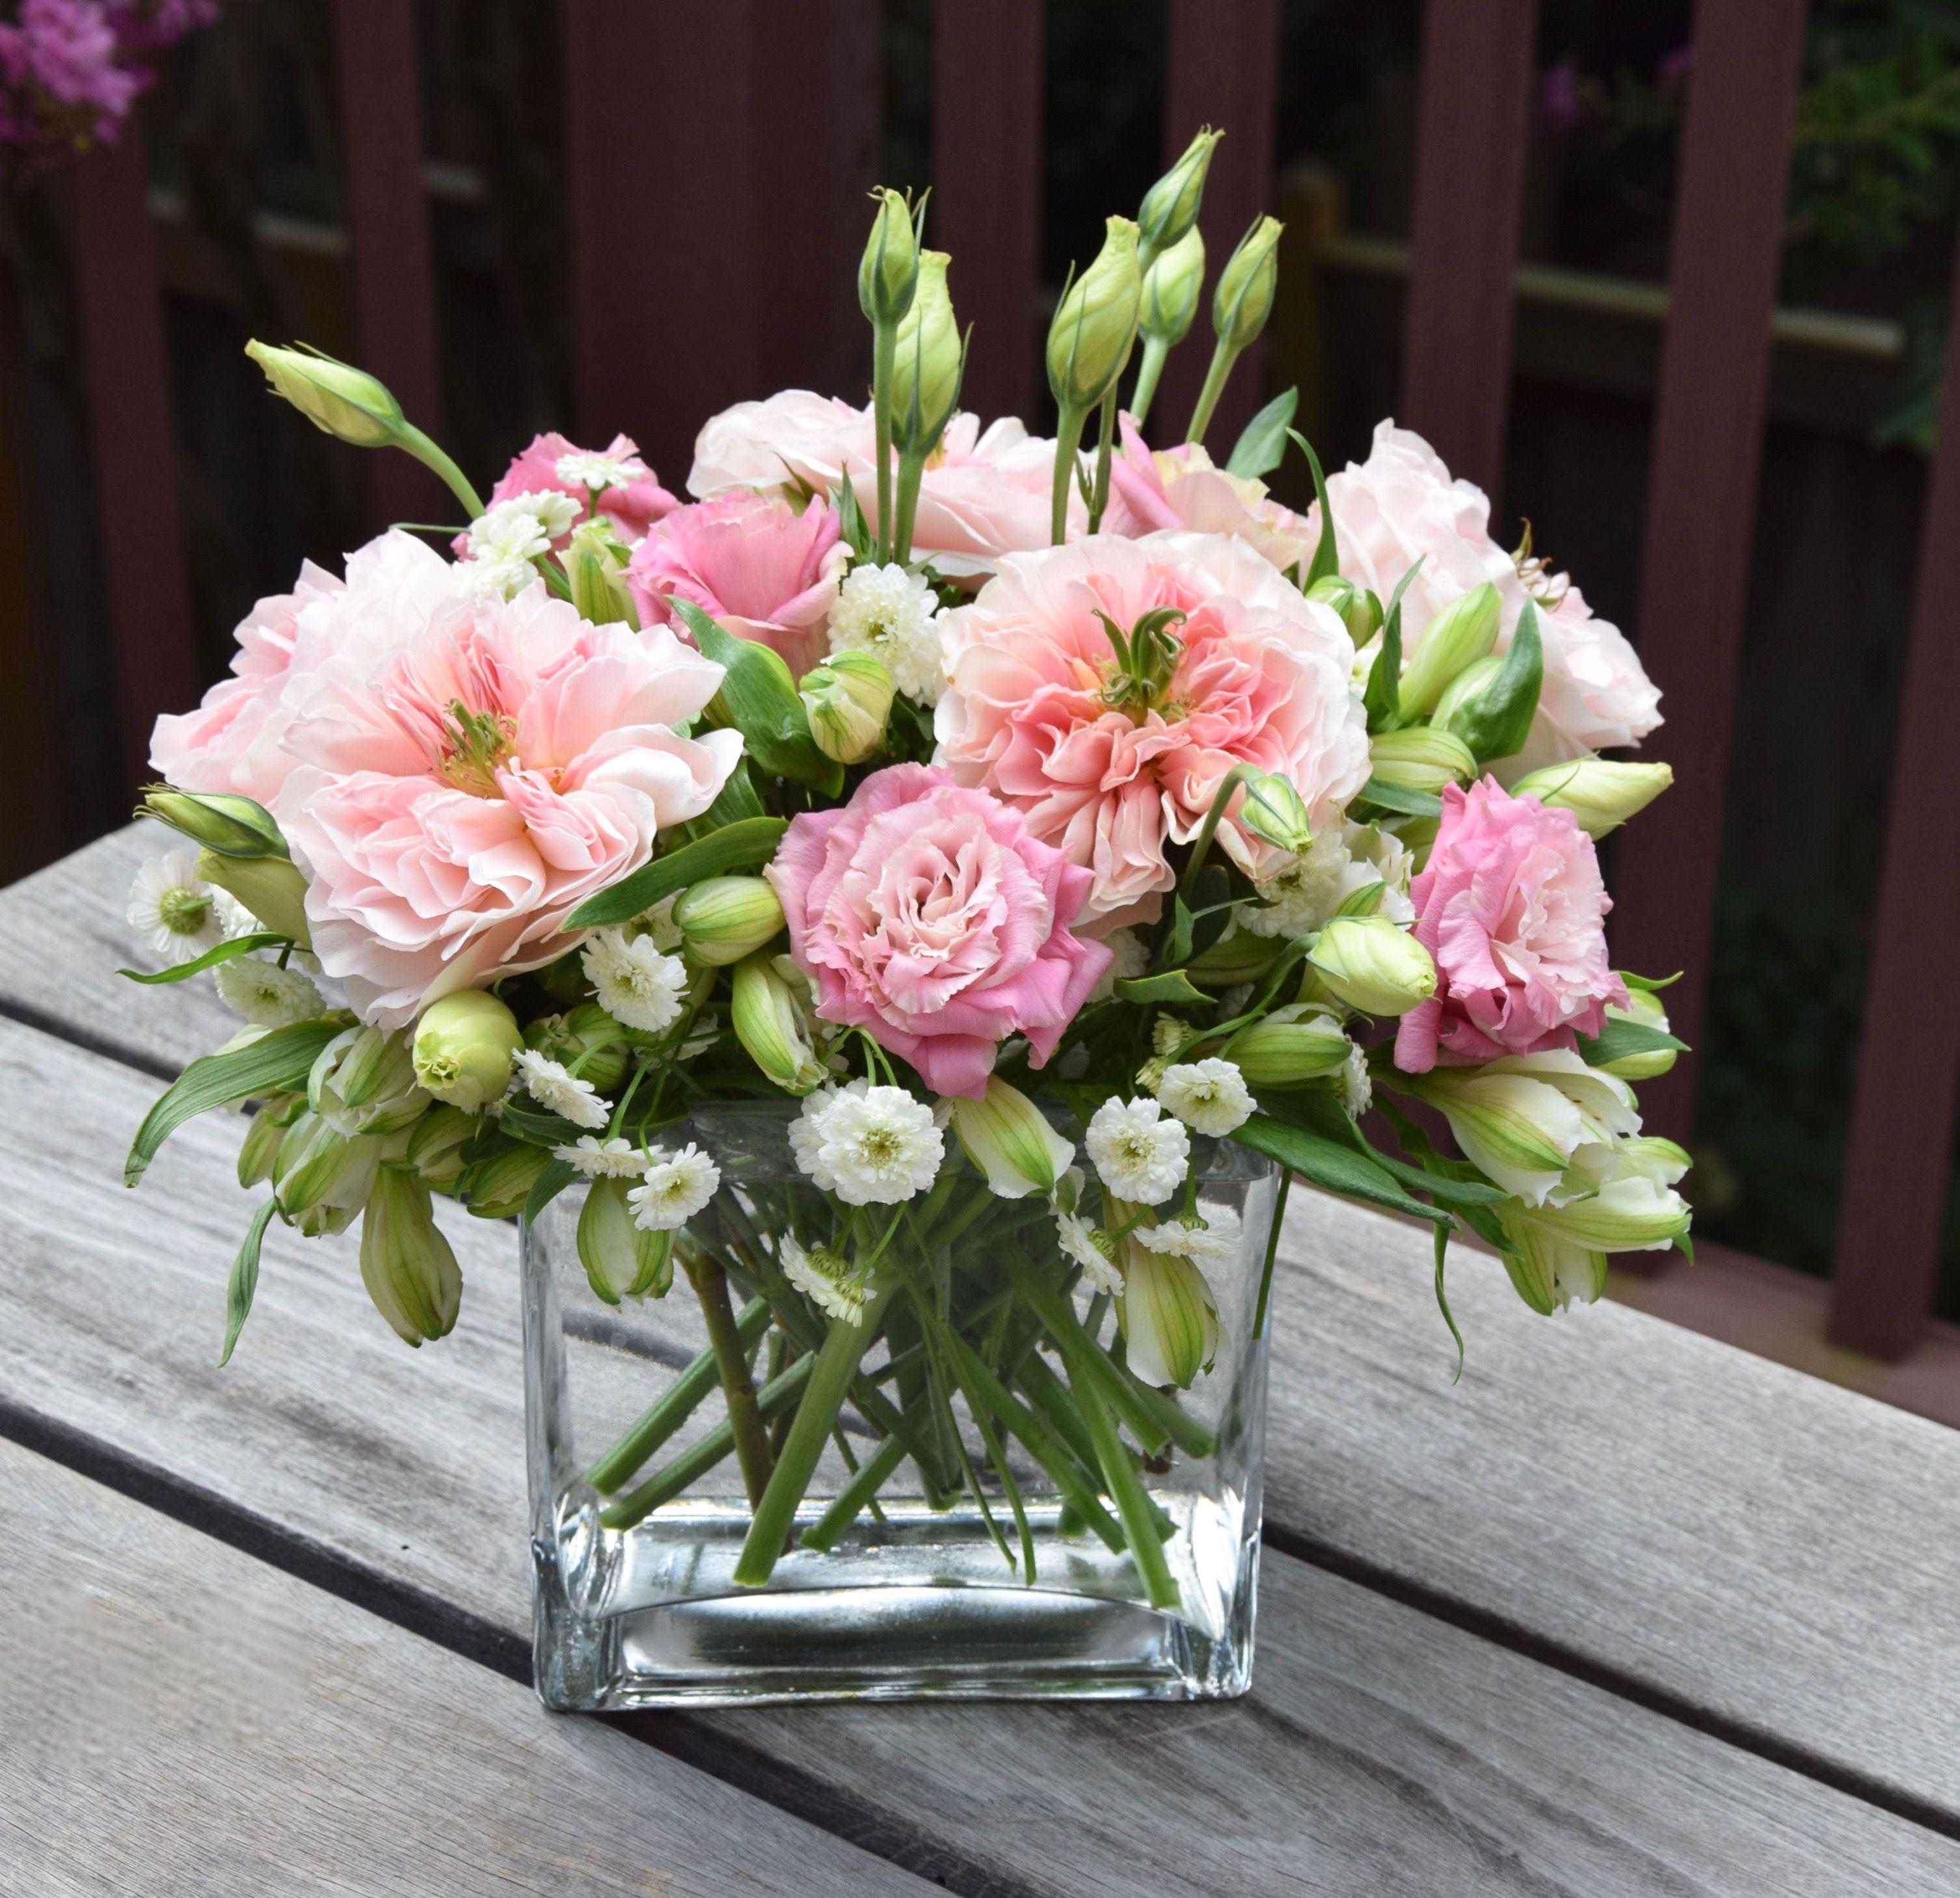 Gorgeous Flower Arrangement With Garden Roses Lisanthus And Alstroemeria Flower Arrangements Simple Rose Flower Arrangements Flower Arrangements